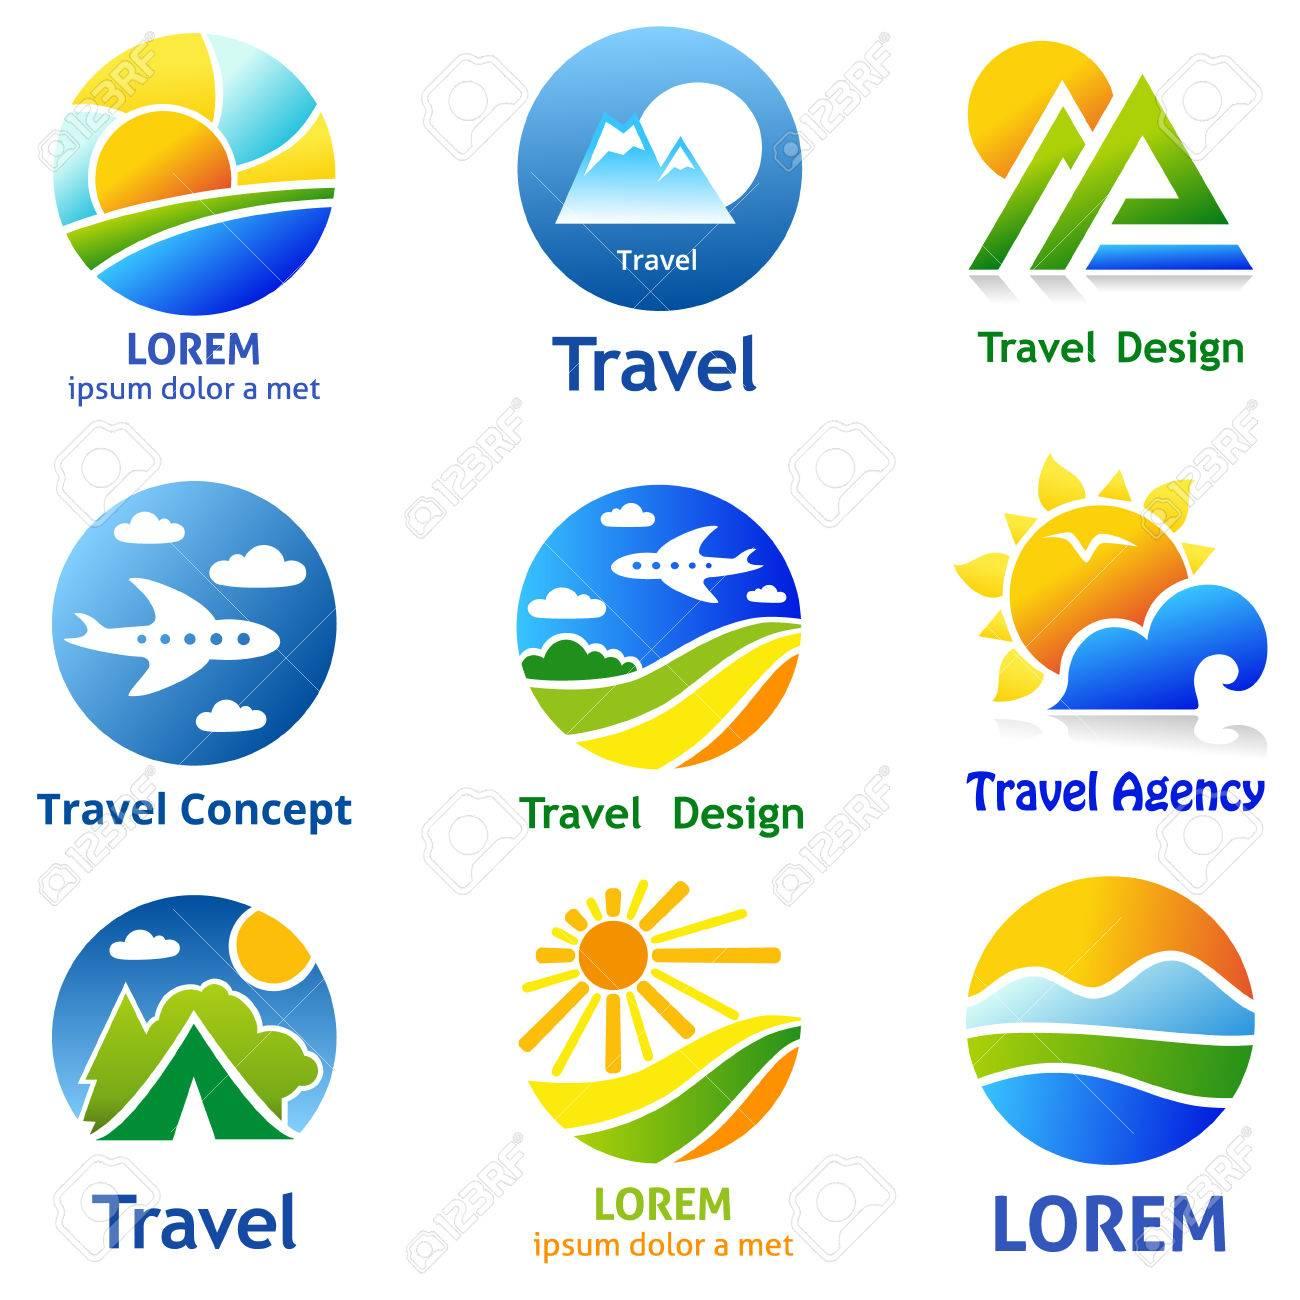 Set Of Travel Business Concept Symbols And Emblems For Travel